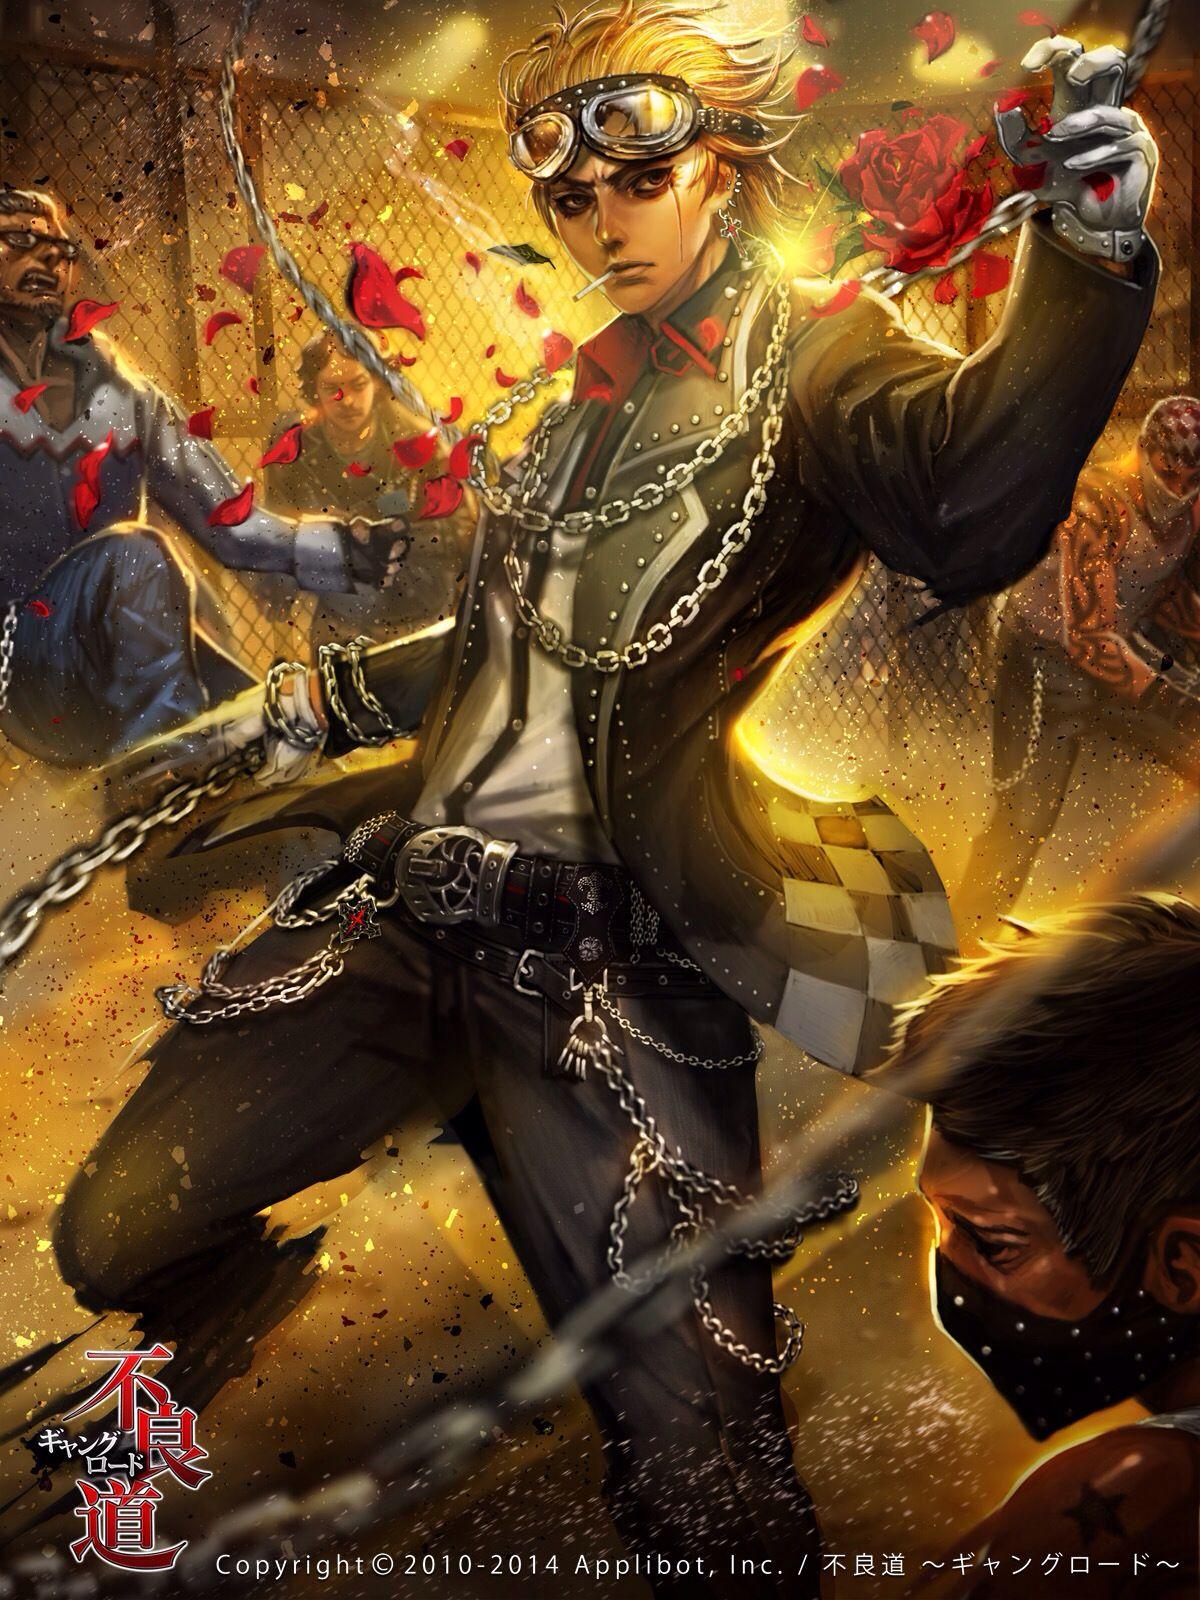 Gran guerrero Anime, Gang road, Character art